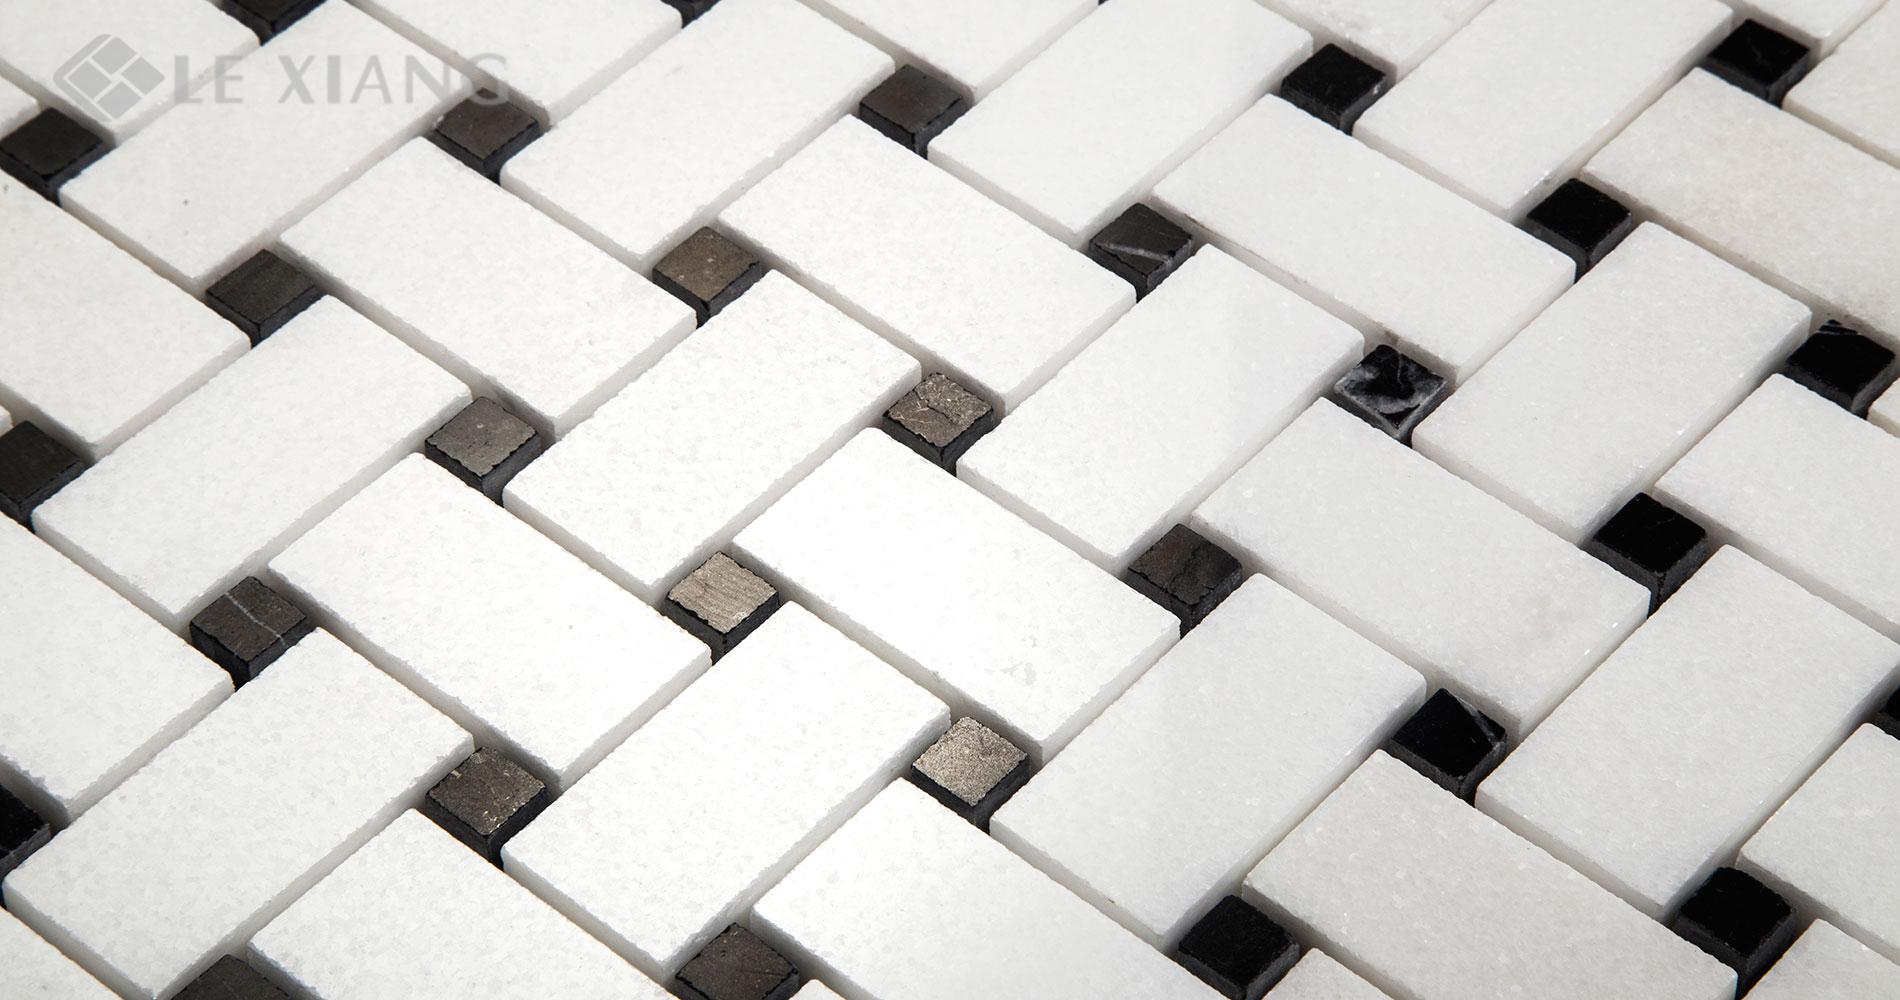 Basketweaveing-White-Thassos-Marble-Mosaic-For-Bothroom-Floors-3